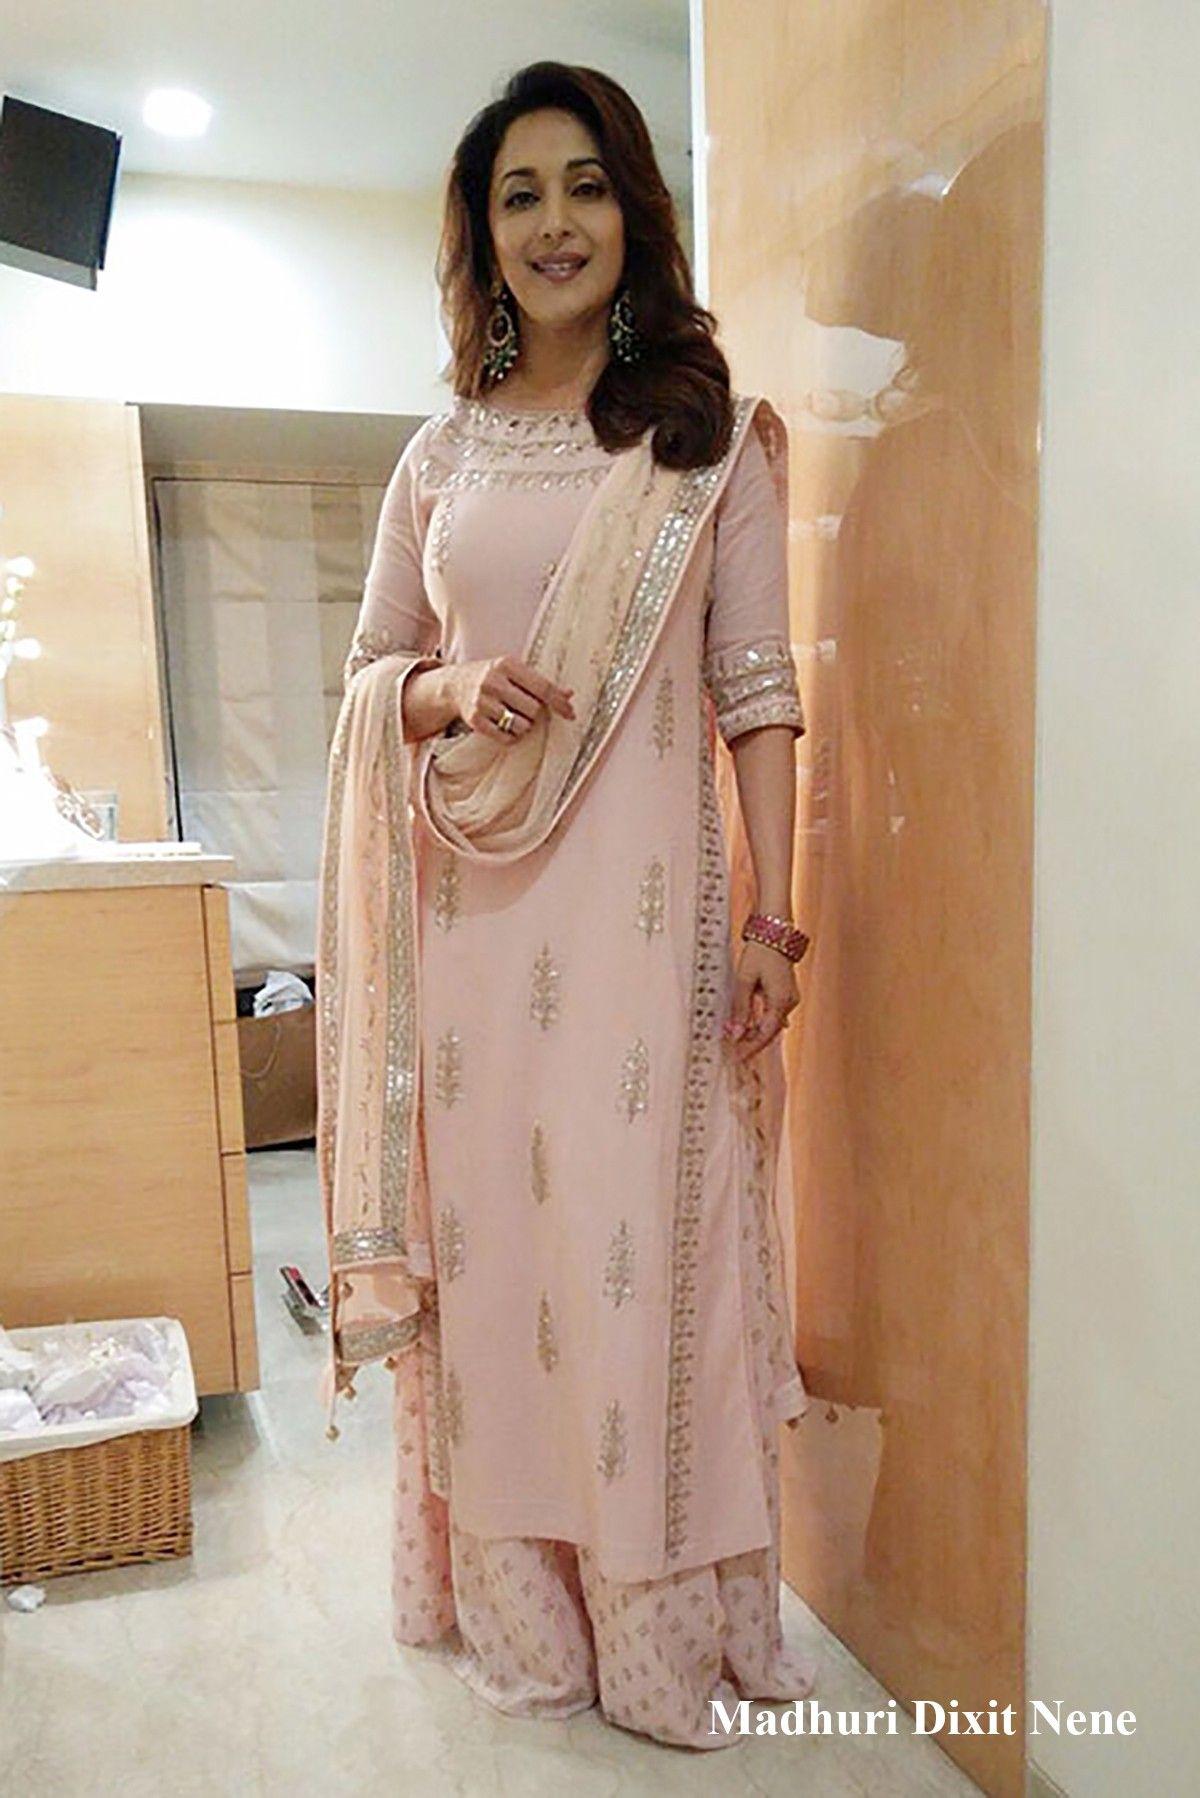 Ihram Kids For Sale Dubai: Featuring An Elegant, Jaipur Pink Kurta With Intricate